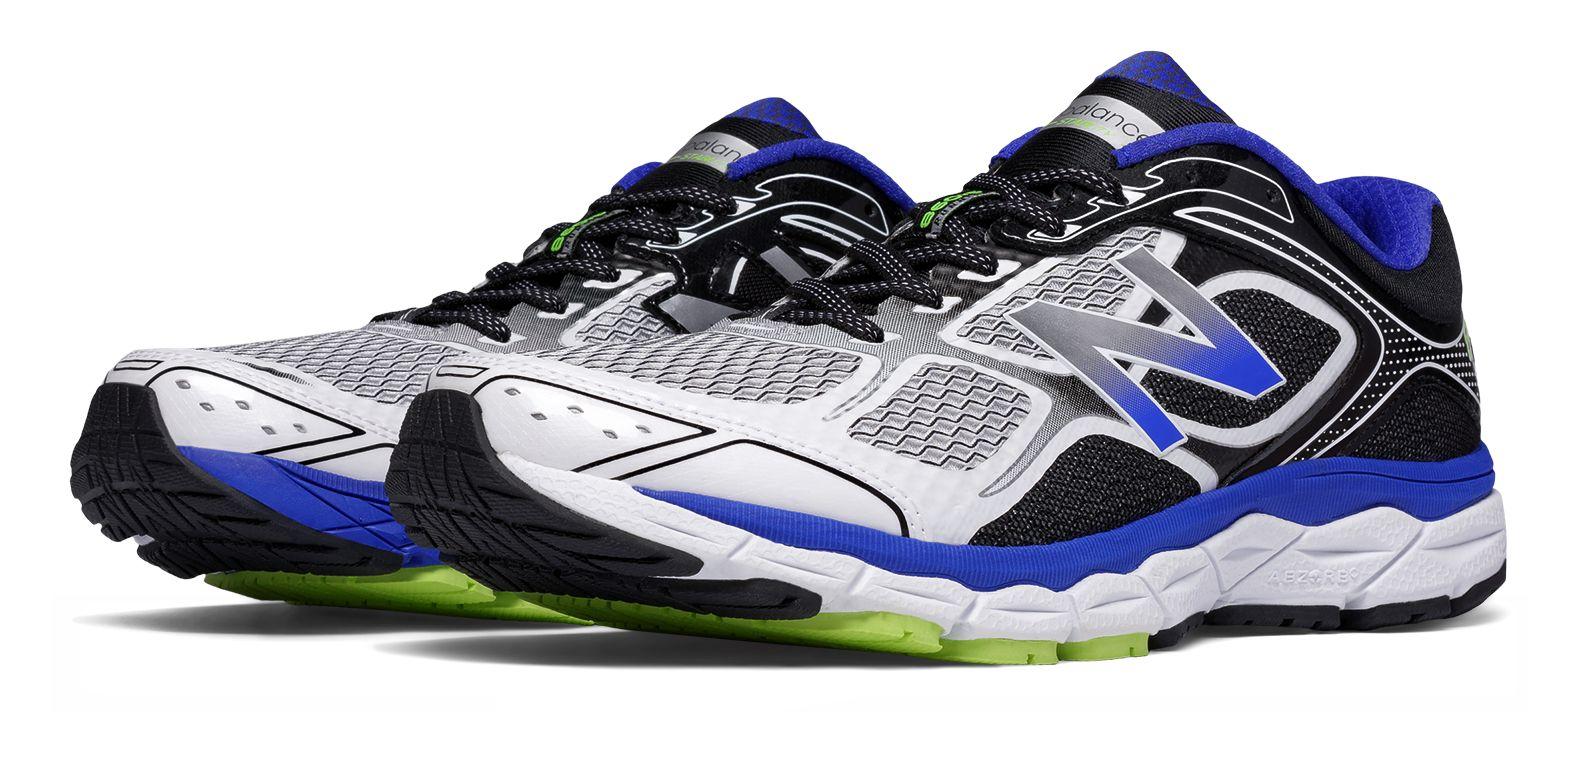 new balance 860v6. new balance 860v6 mens shoes white with blue